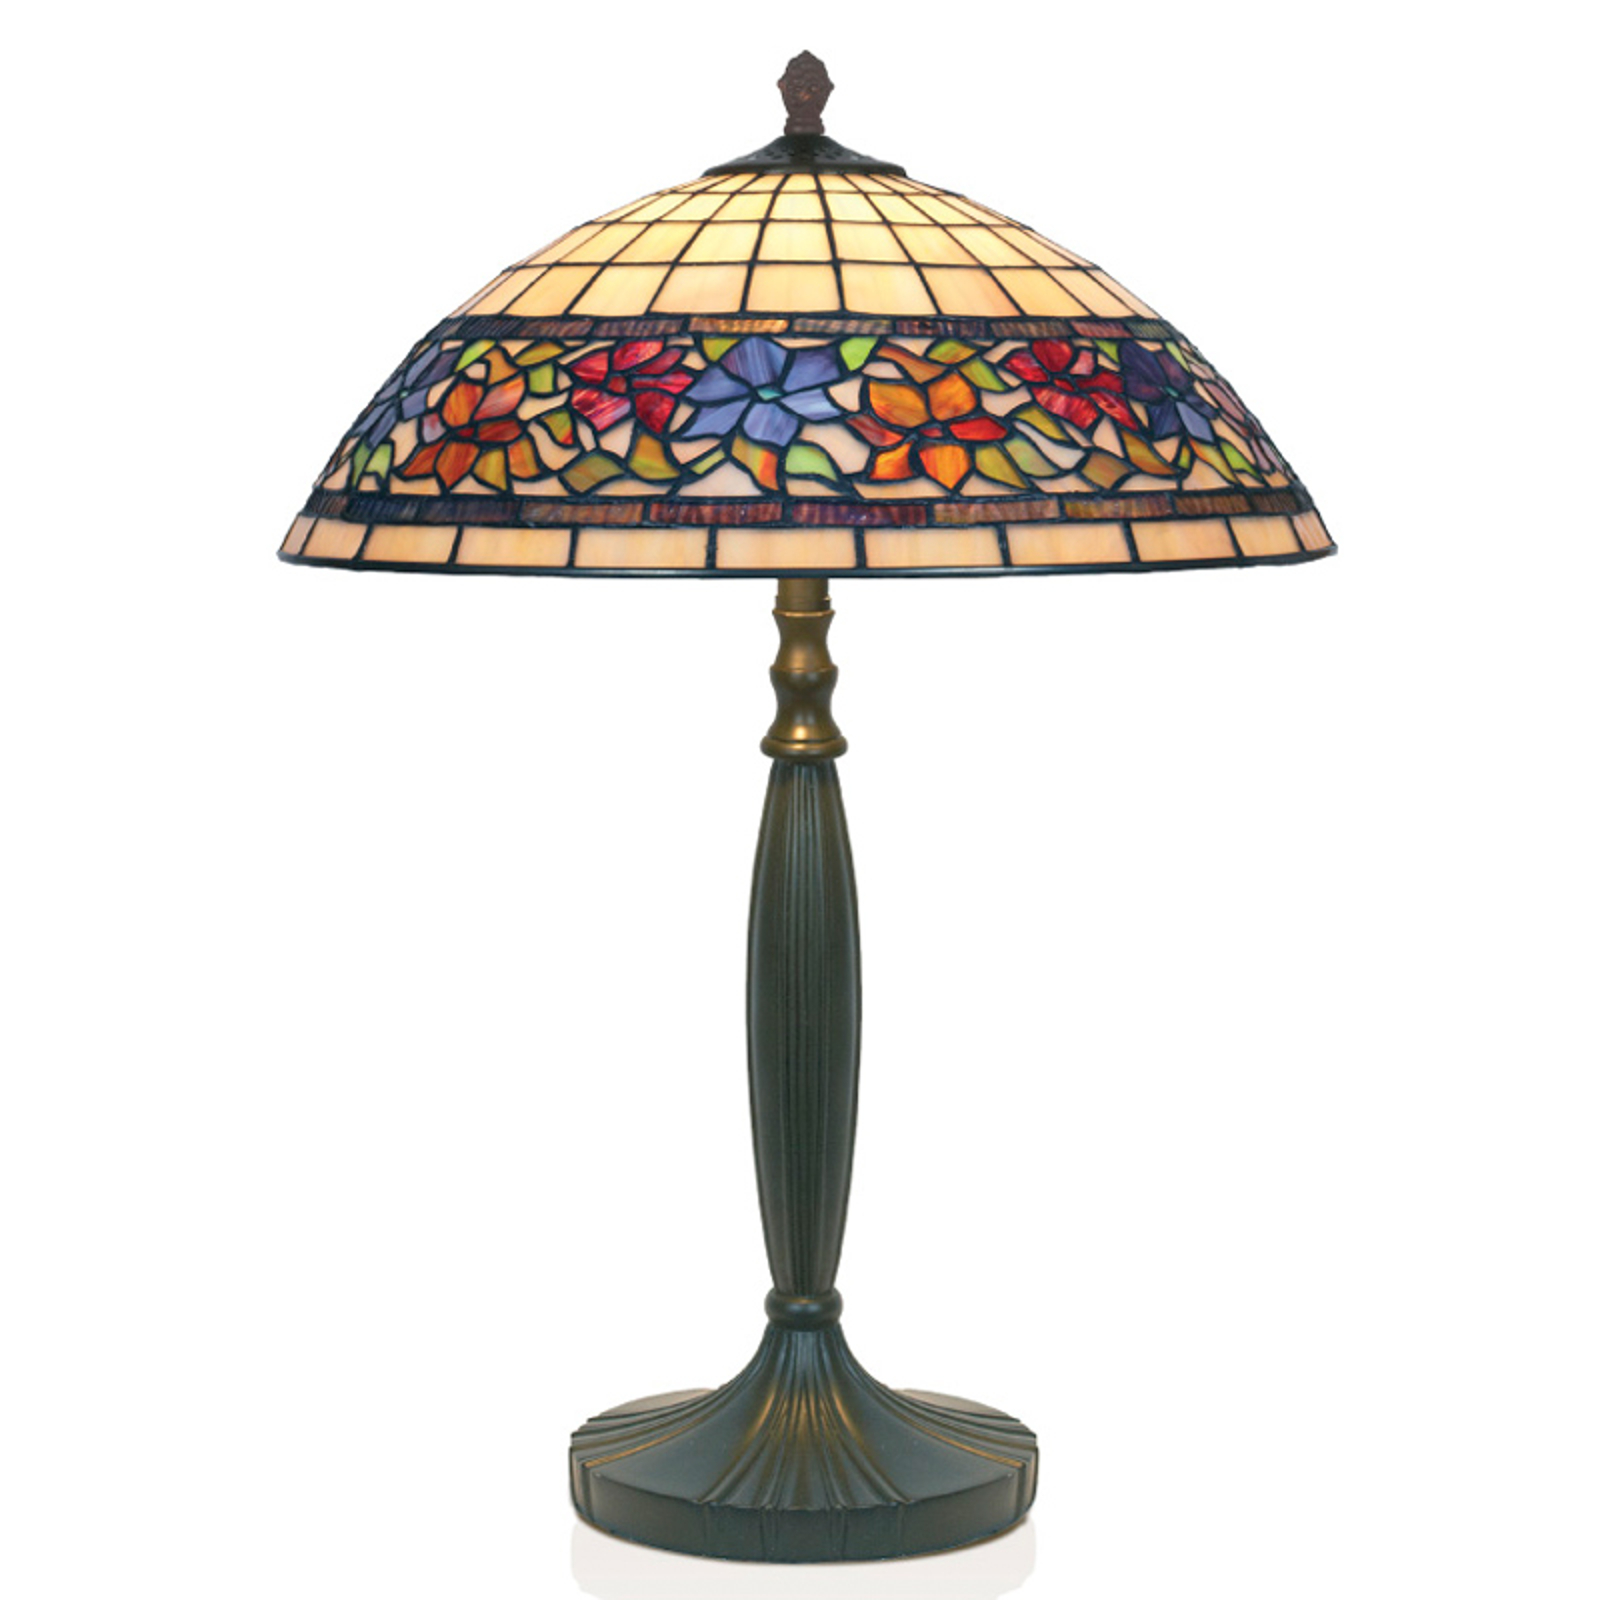 FLORA handmade Tiffany-style table lamp_1032128_1